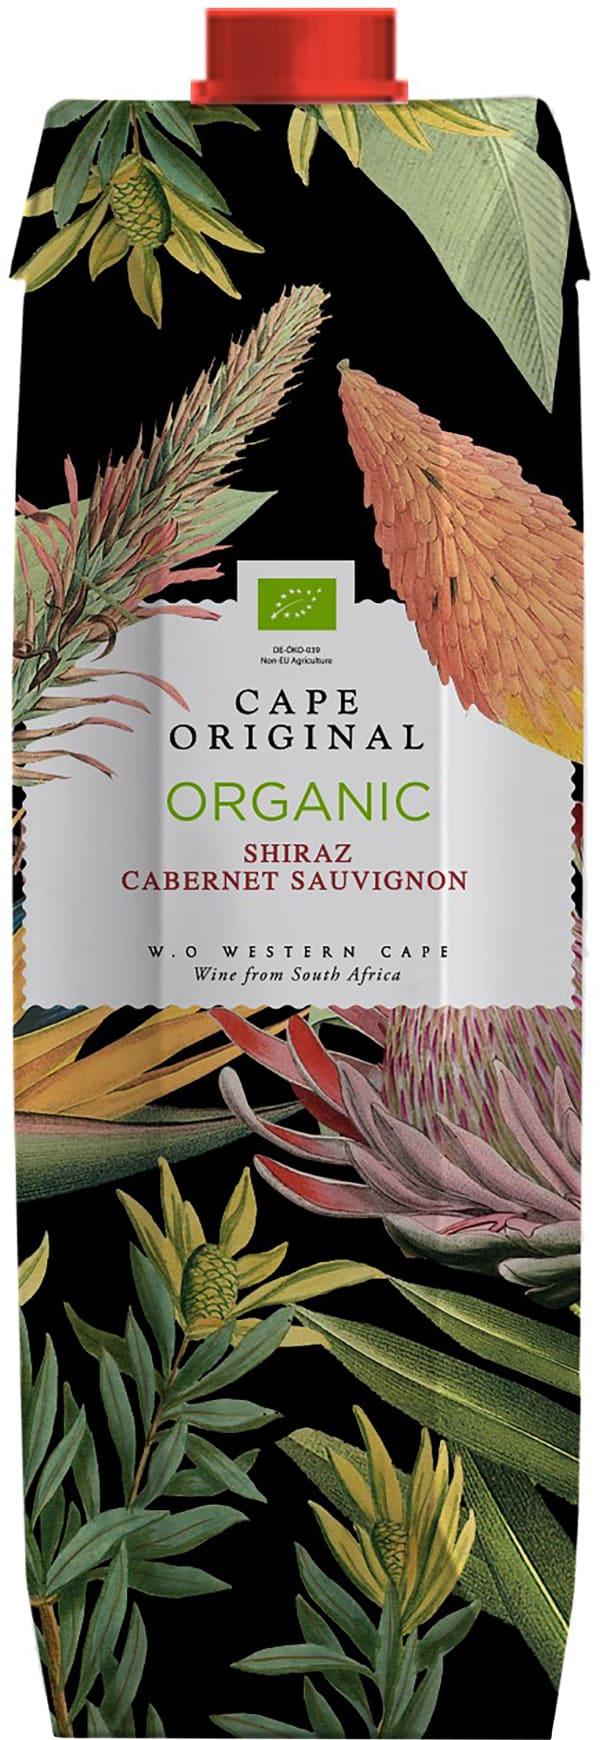 Cape Original Shiraz Cabernet Sauvignon Organic 2015 kartongförpackning